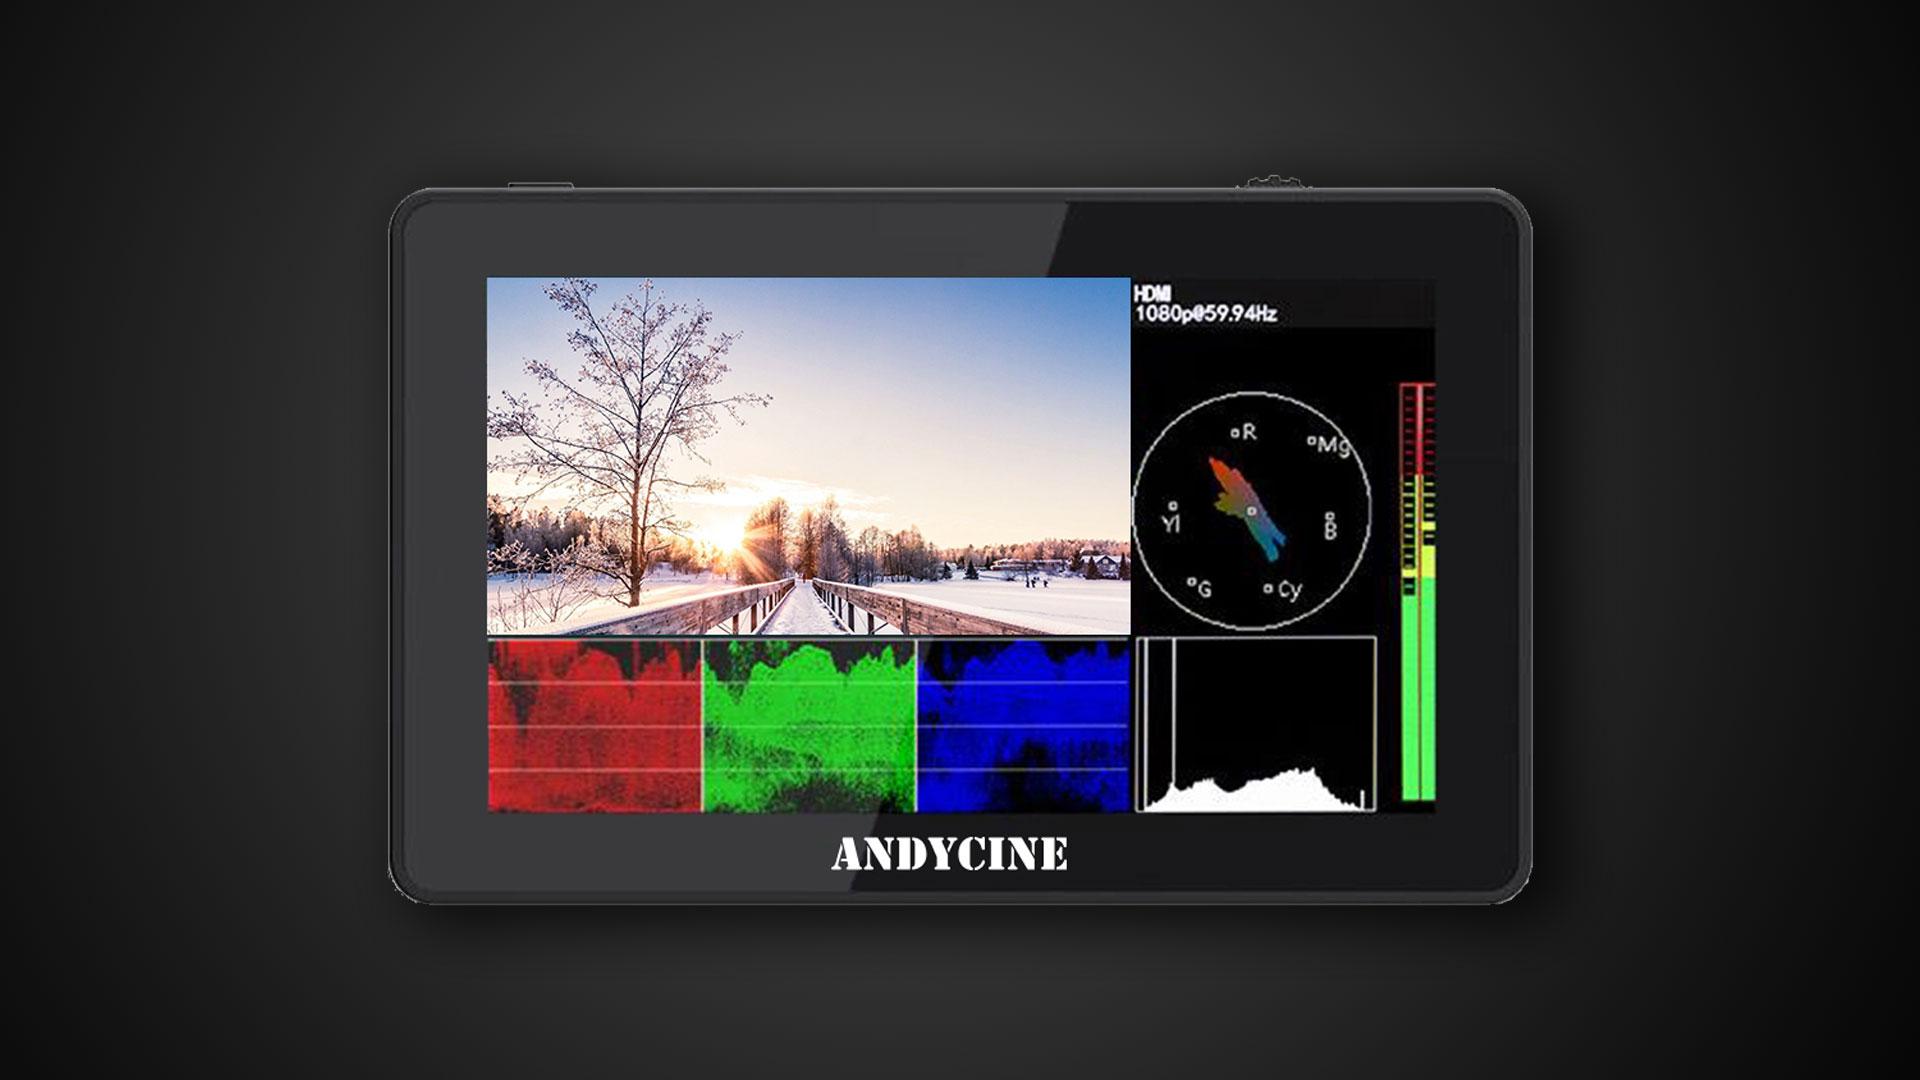 ANDYCINEがA6 Plus V2モニターを発表